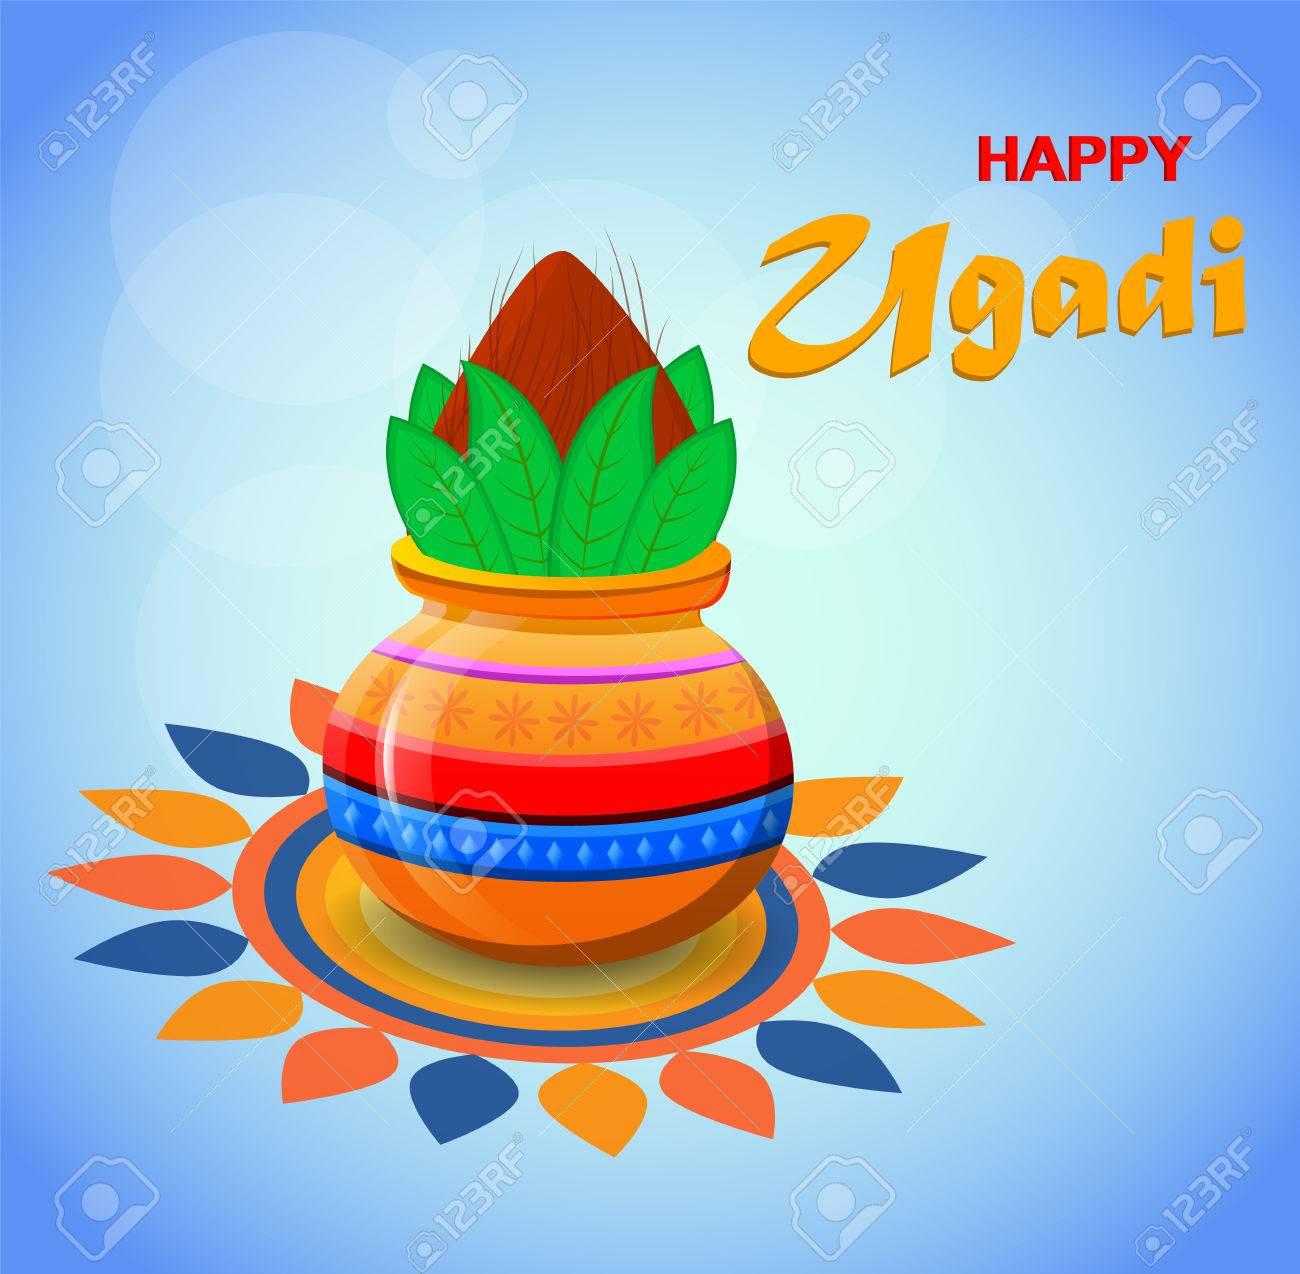 Happy Ugadi And Gudi Padwa Hindu New Year Greeting Card For